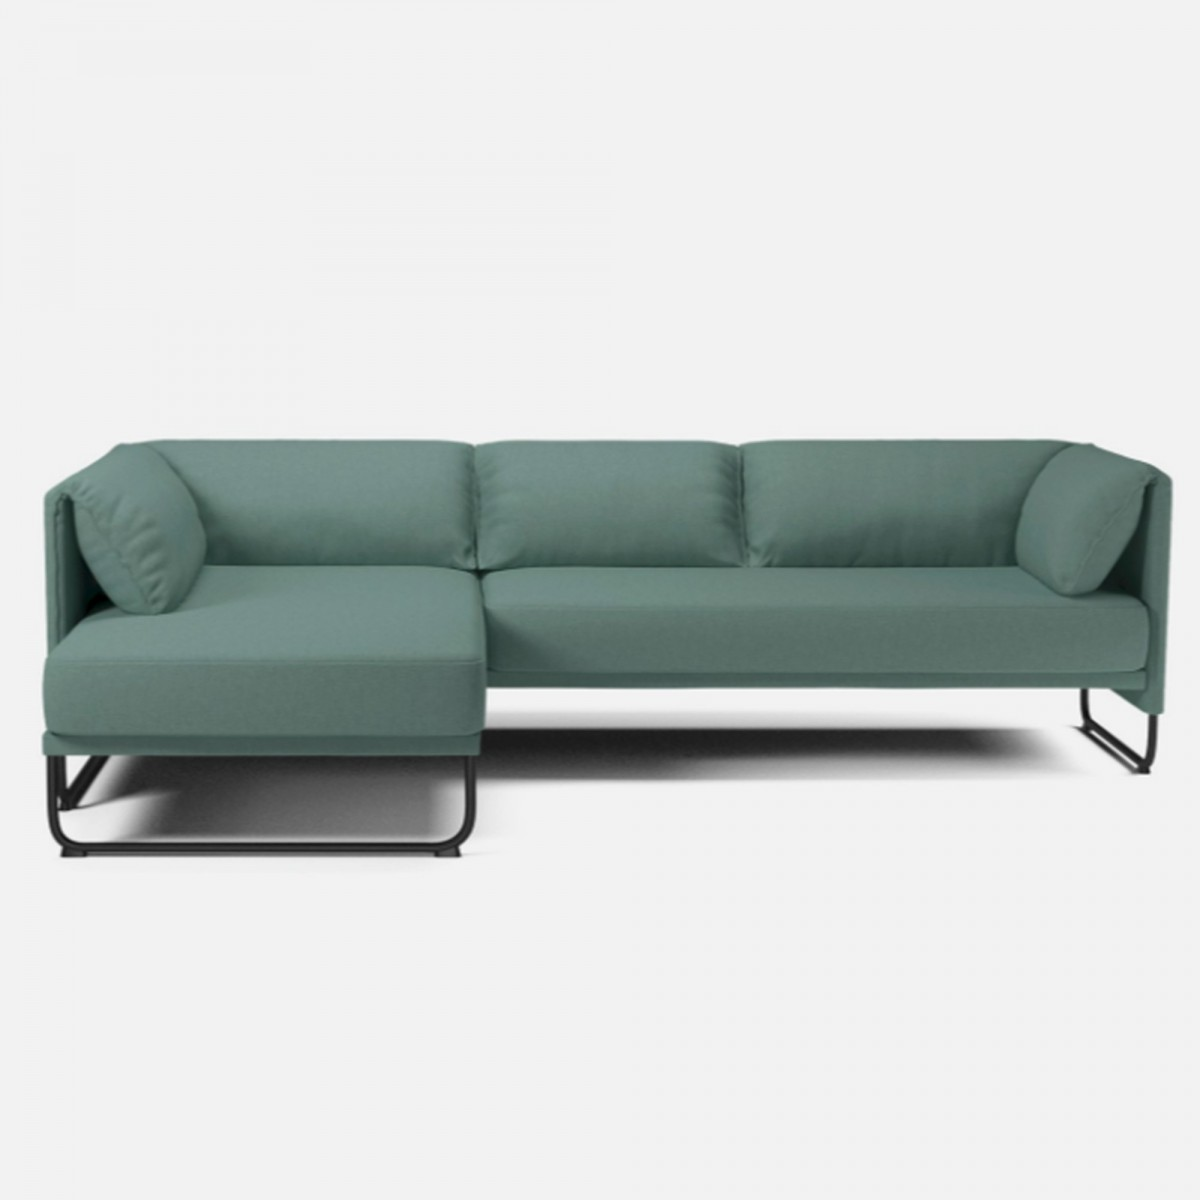 canap mara 3 places avec chaise longue bolia. Black Bedroom Furniture Sets. Home Design Ideas